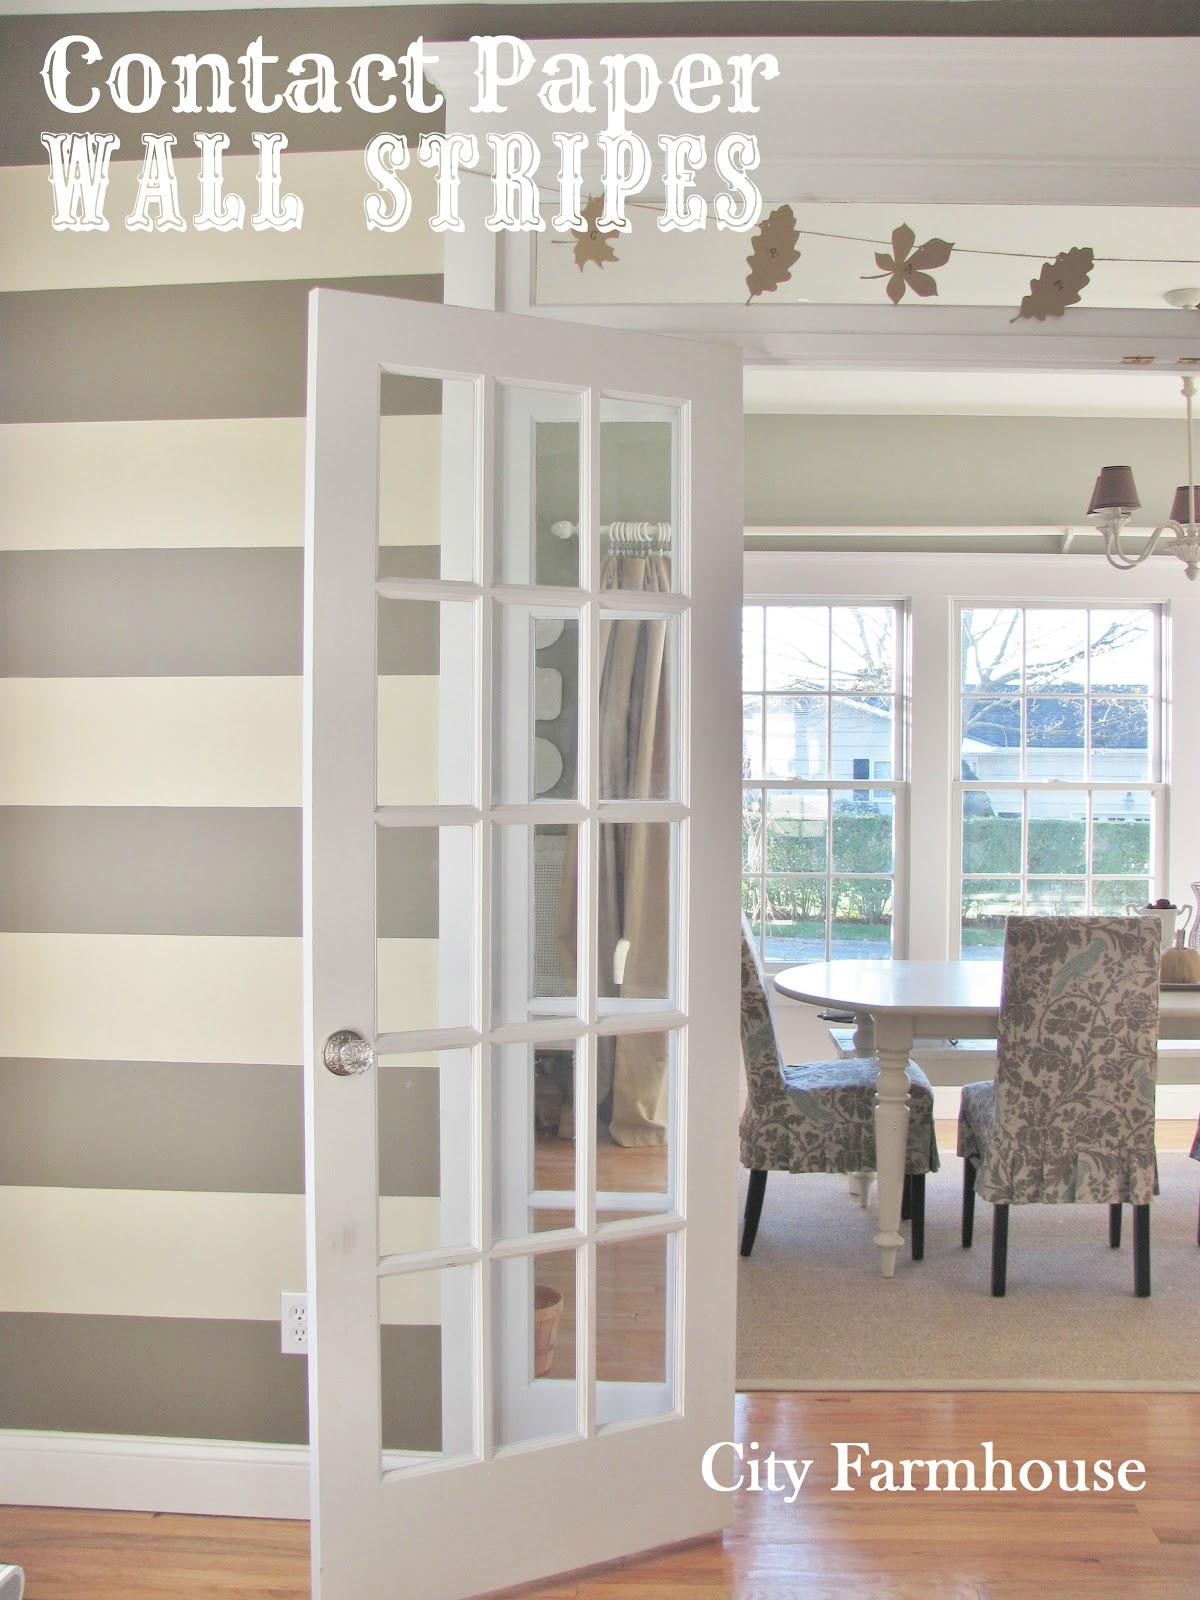 Contact Paper Wall Stripes - City Farmhouse